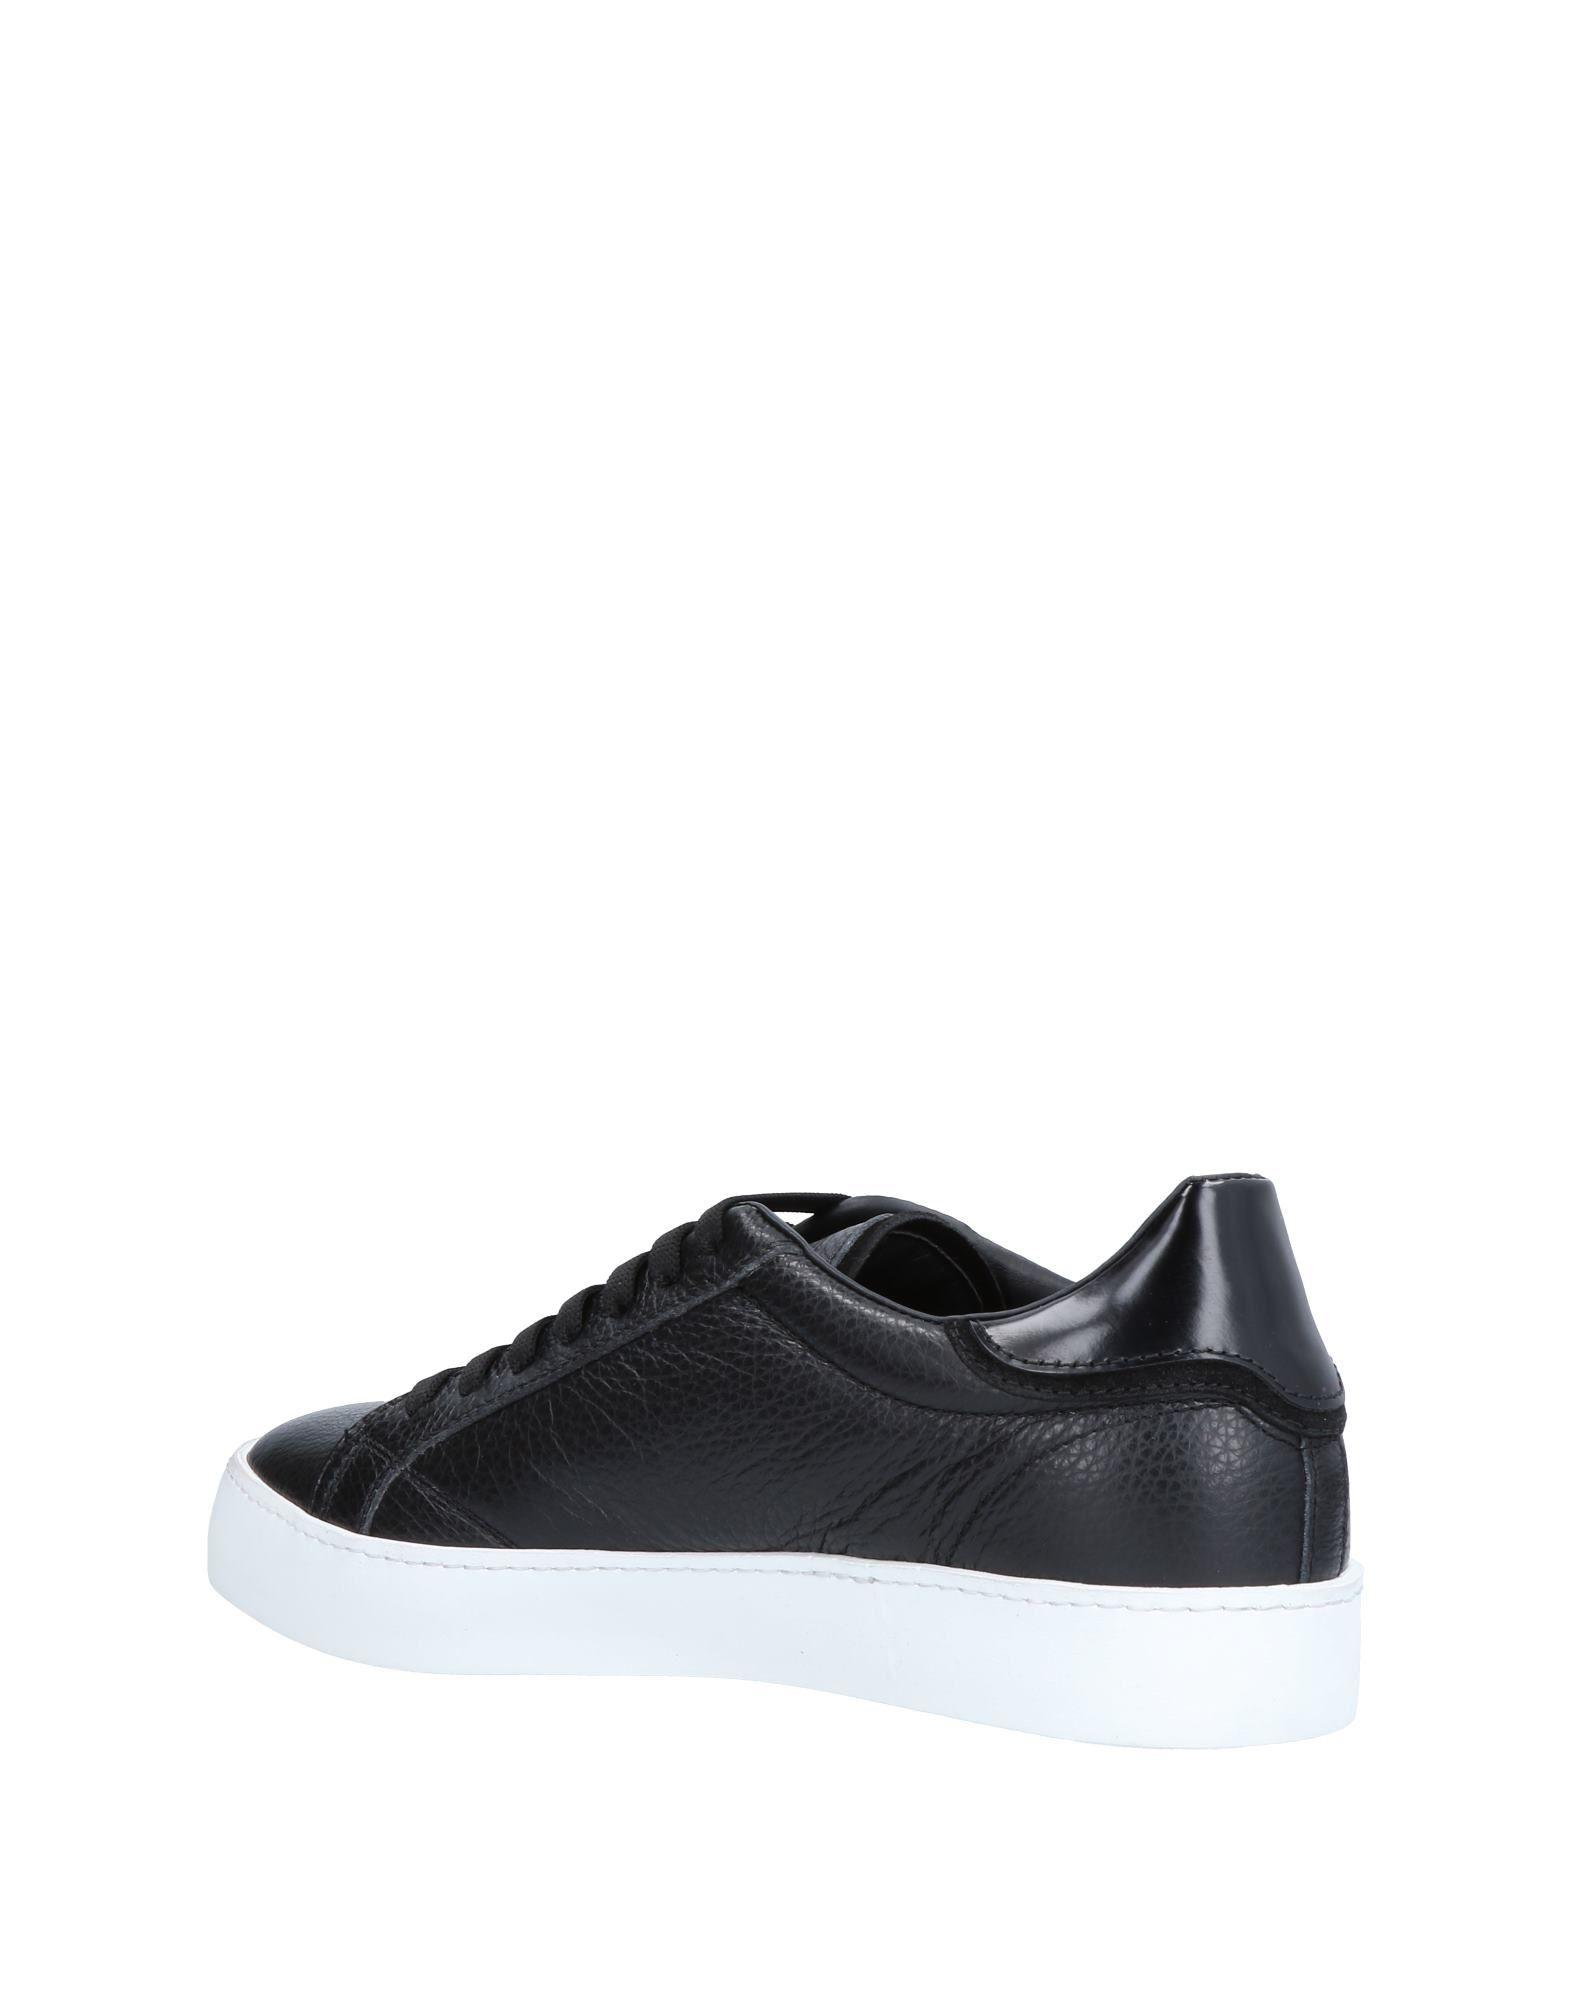 John Galliano Sneakers 11450444TC Herren  11450444TC Sneakers feb497